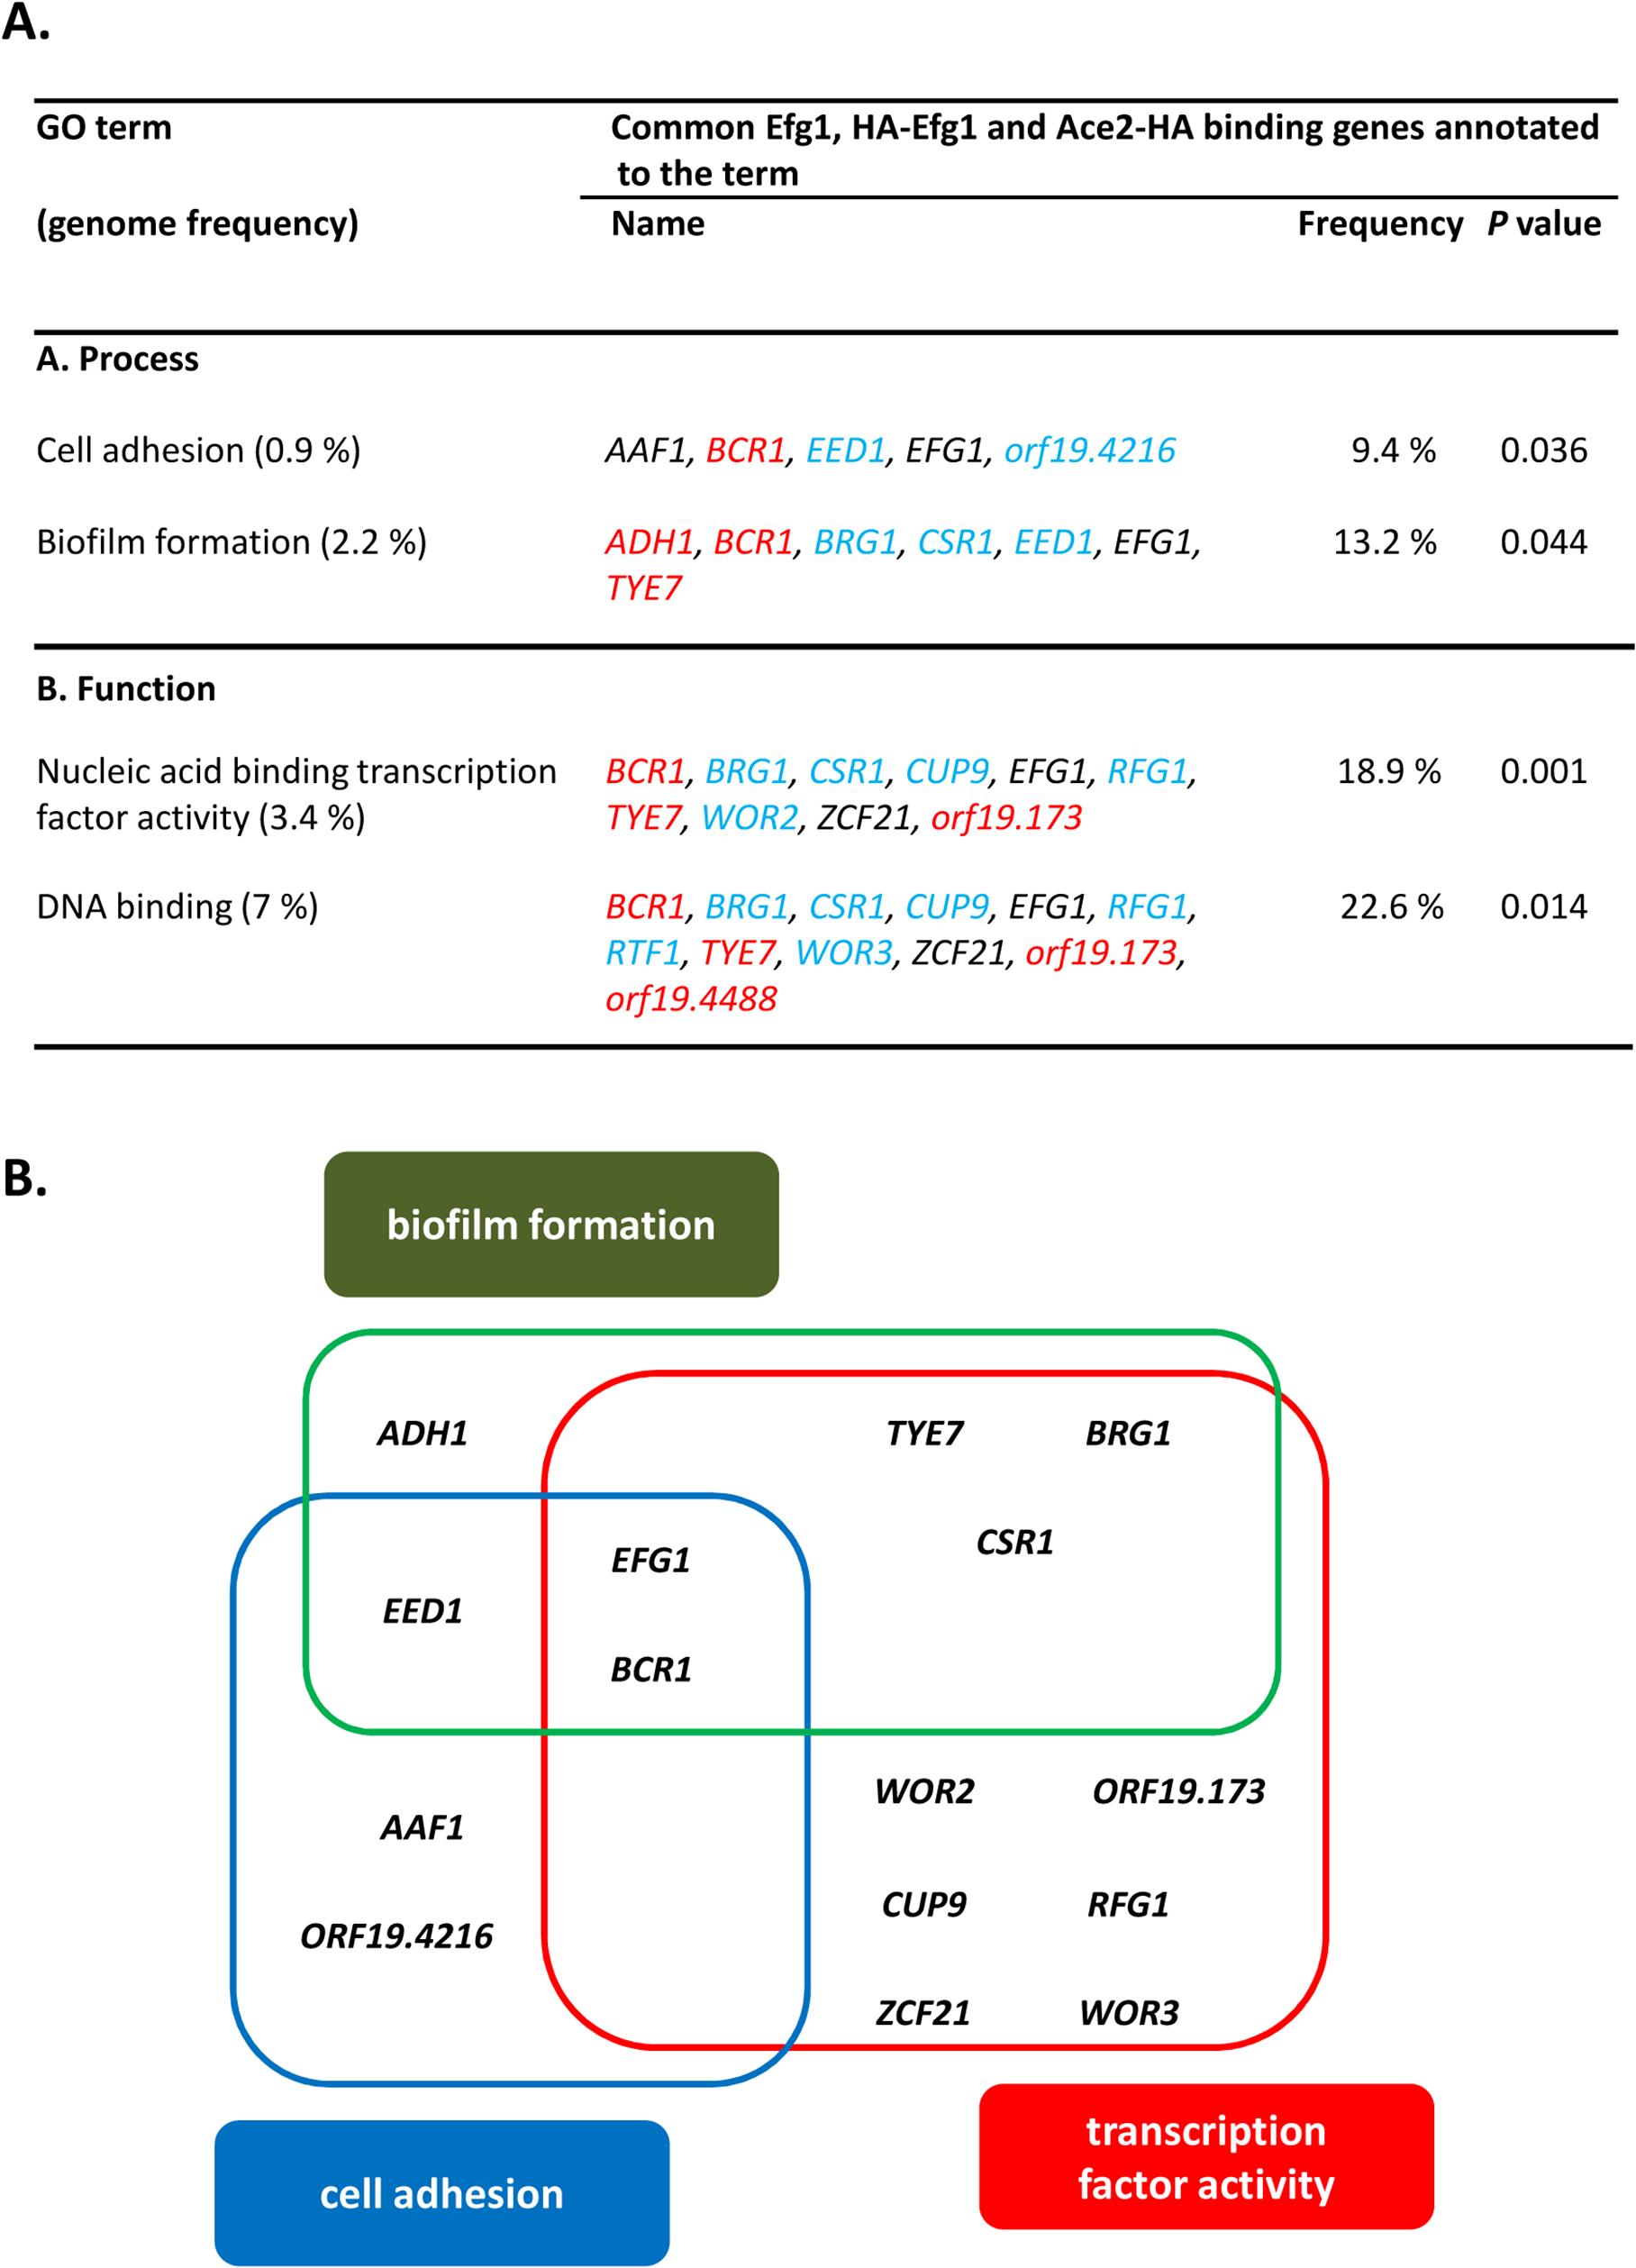 GO categories of common untagged Efg1 (Efg1), HA-Efg1 and Ace2-HA target genes under hypoxia.